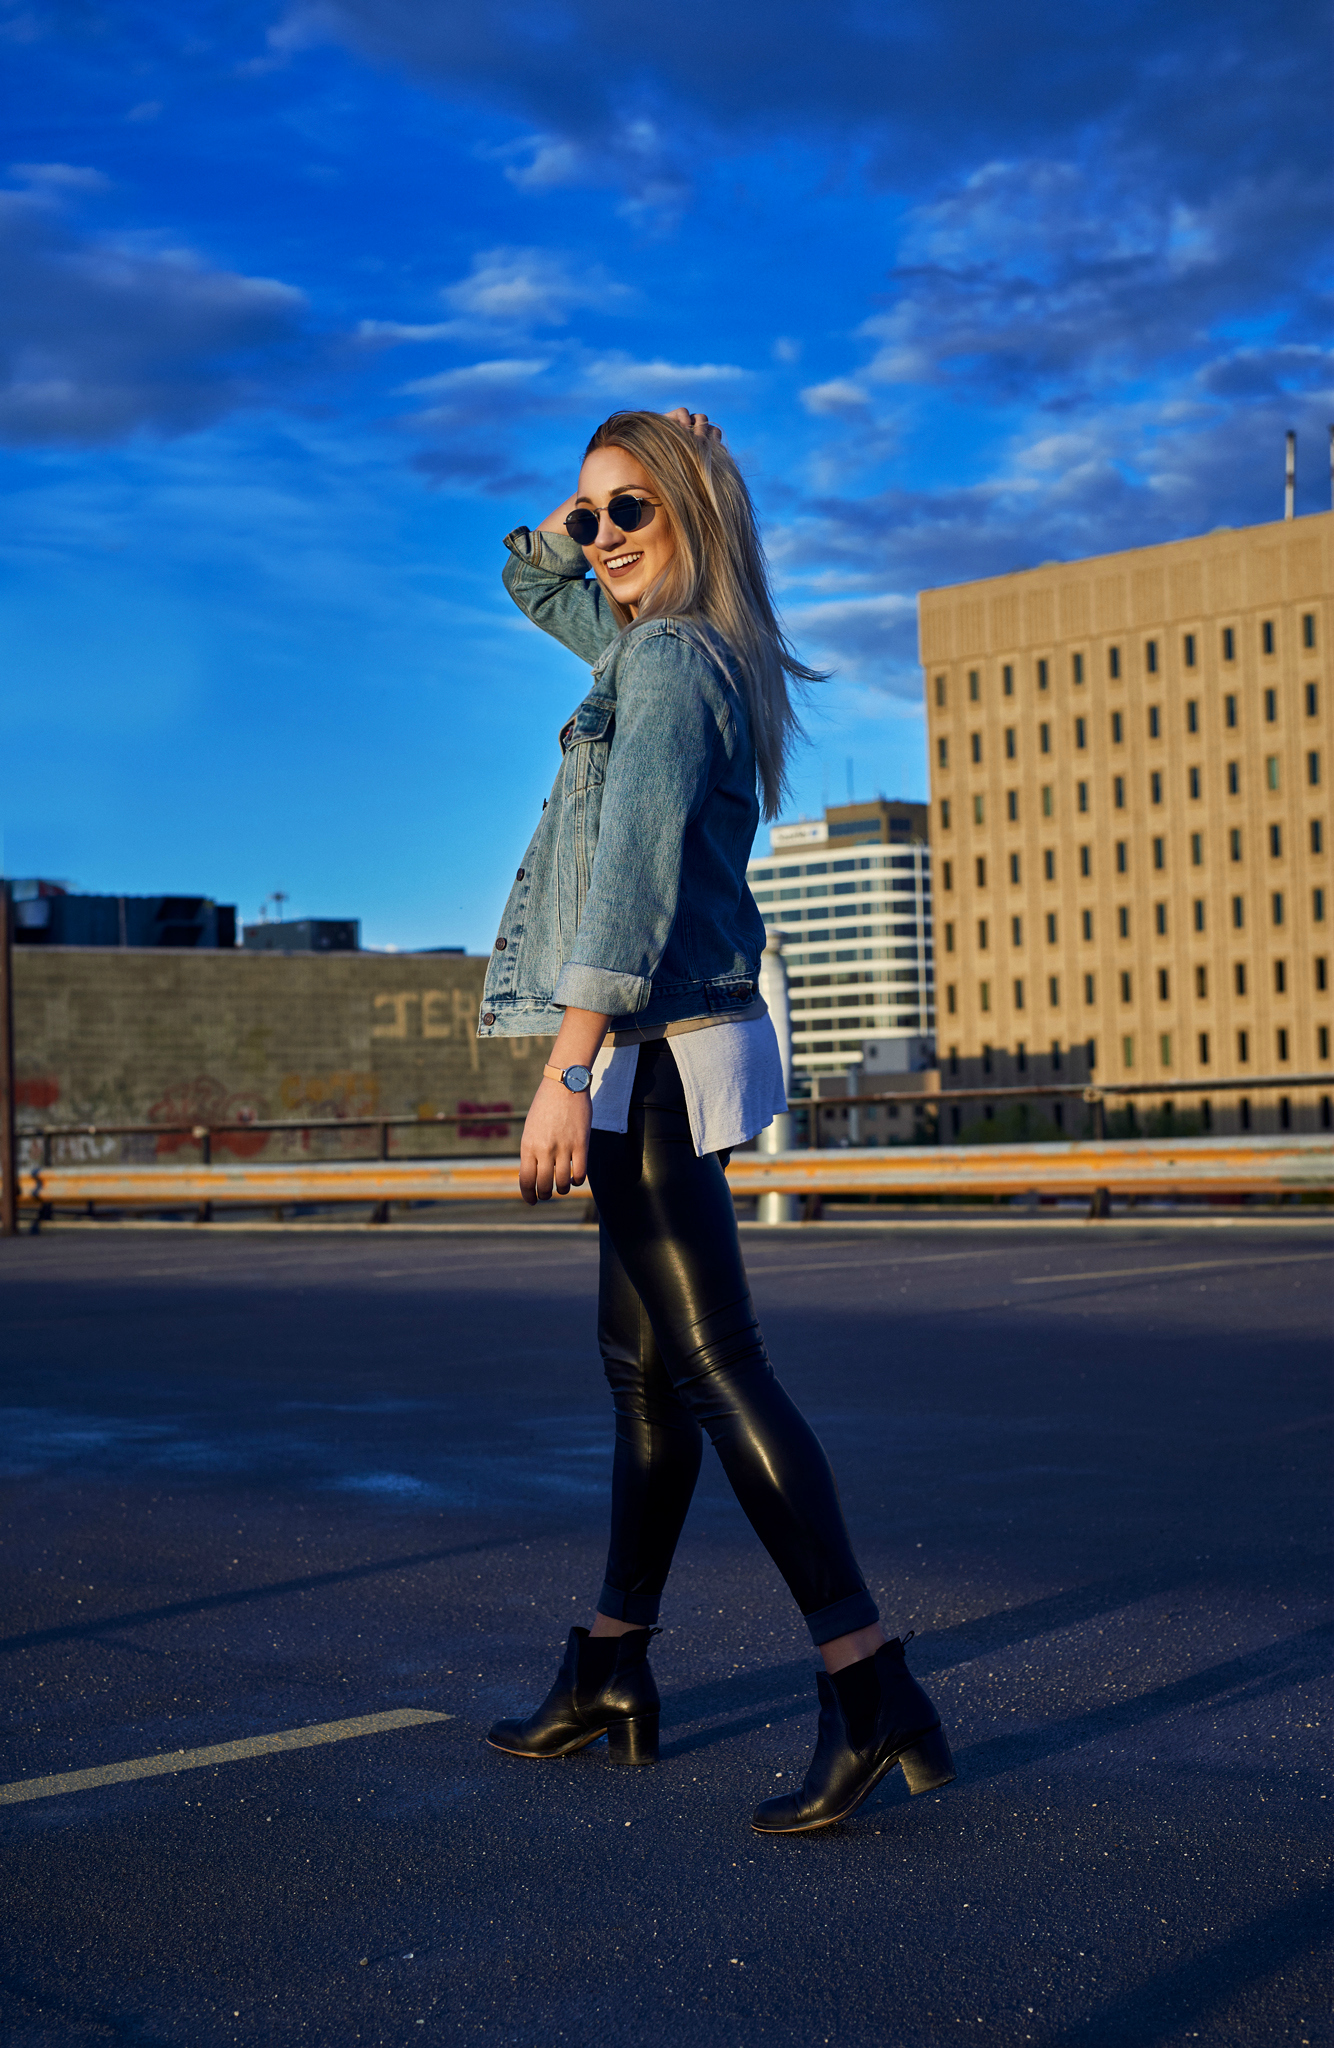 brittany lauren saskatoon fashion blogger spareparts aritzia ootd